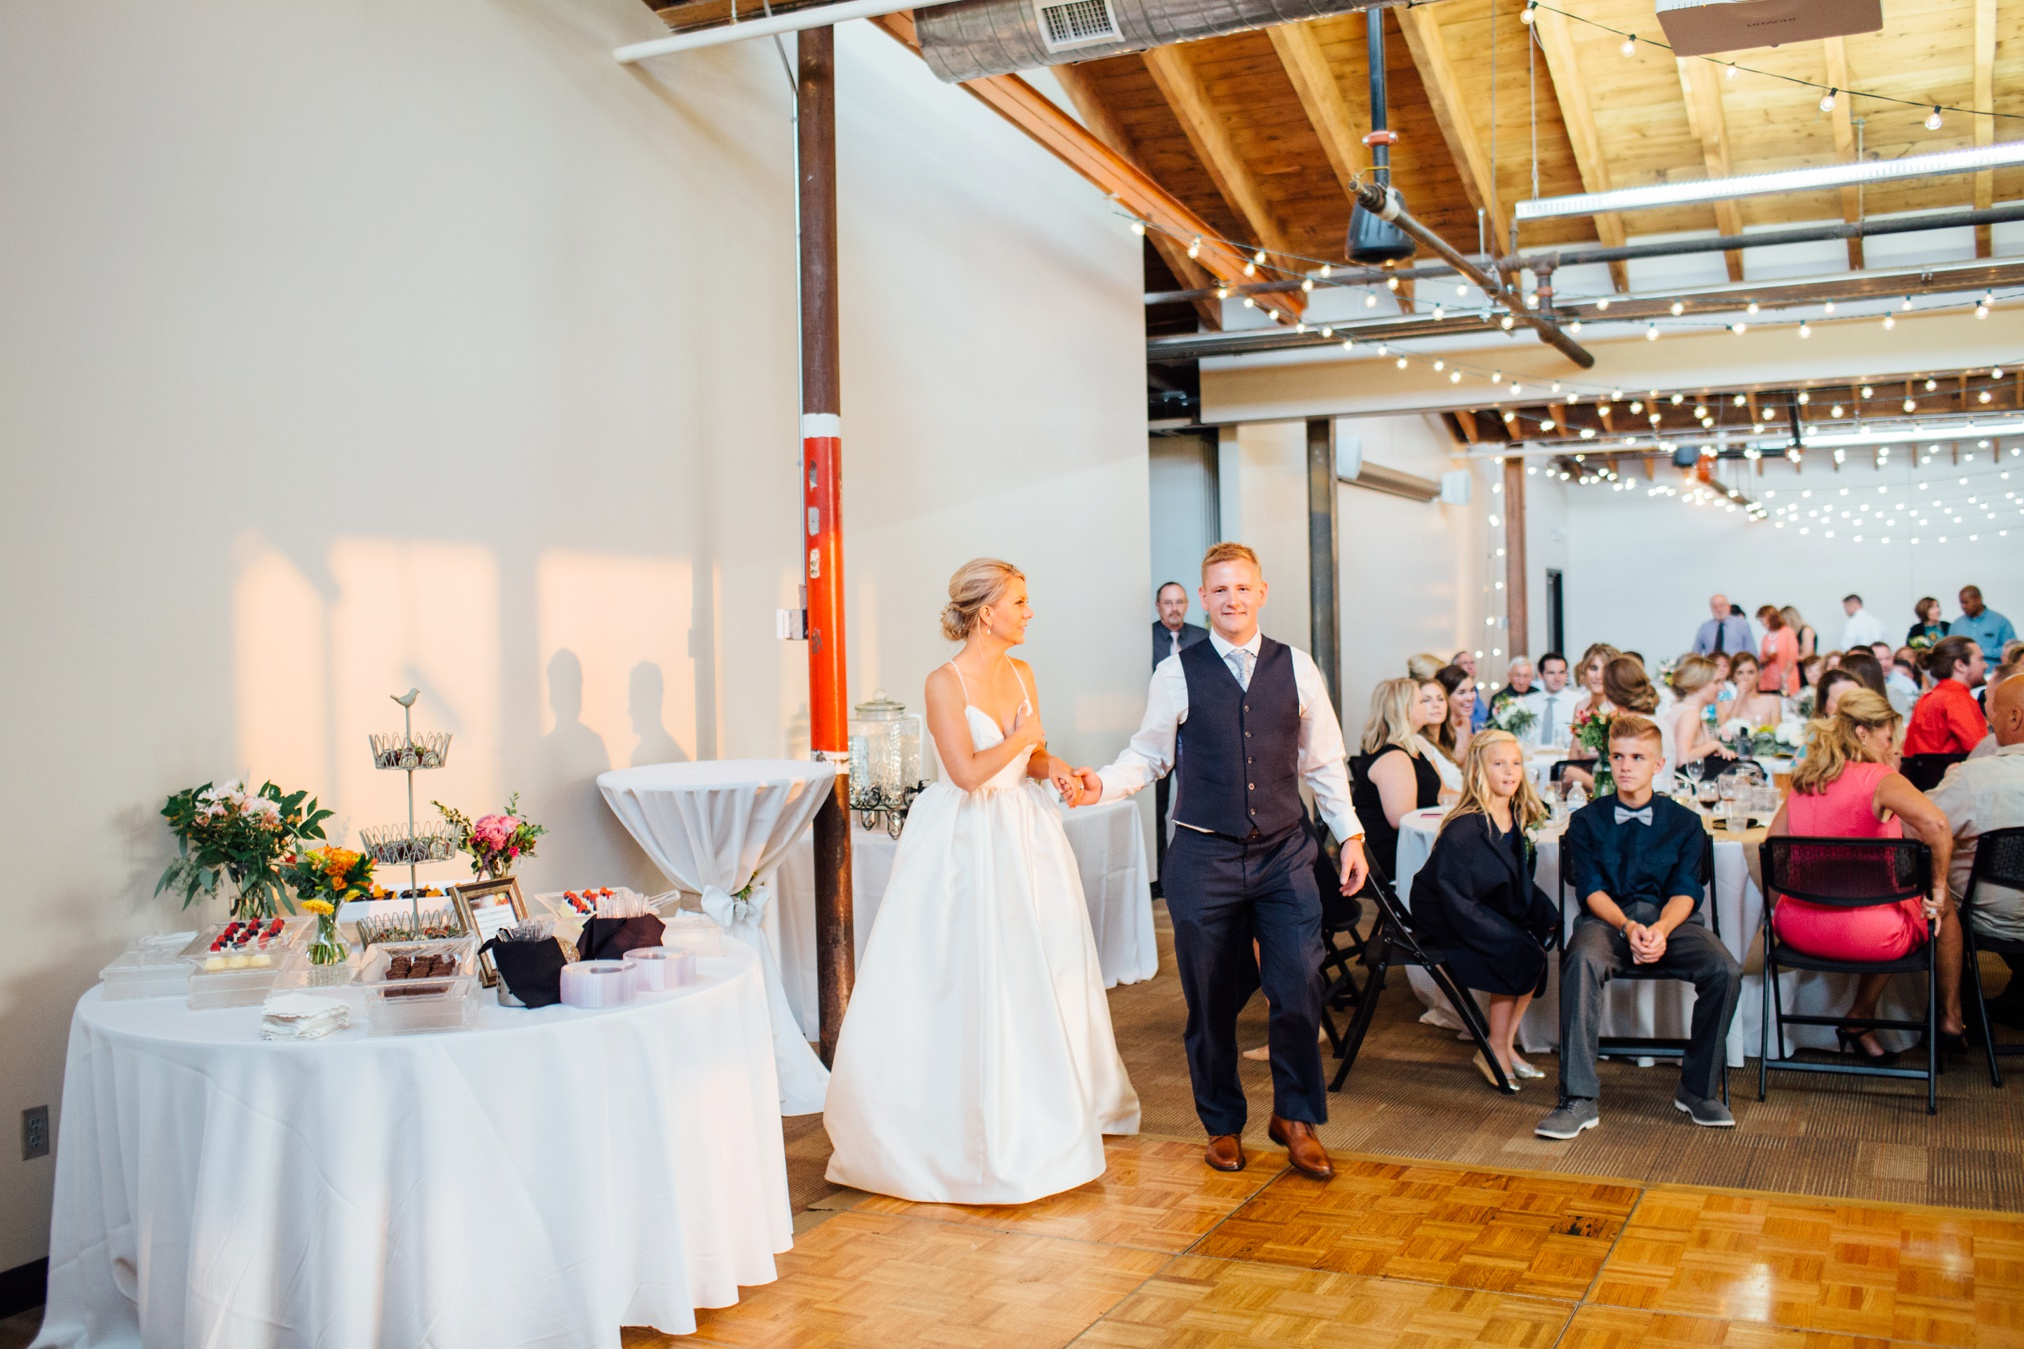 brenna+michael_wedding-682.jpg